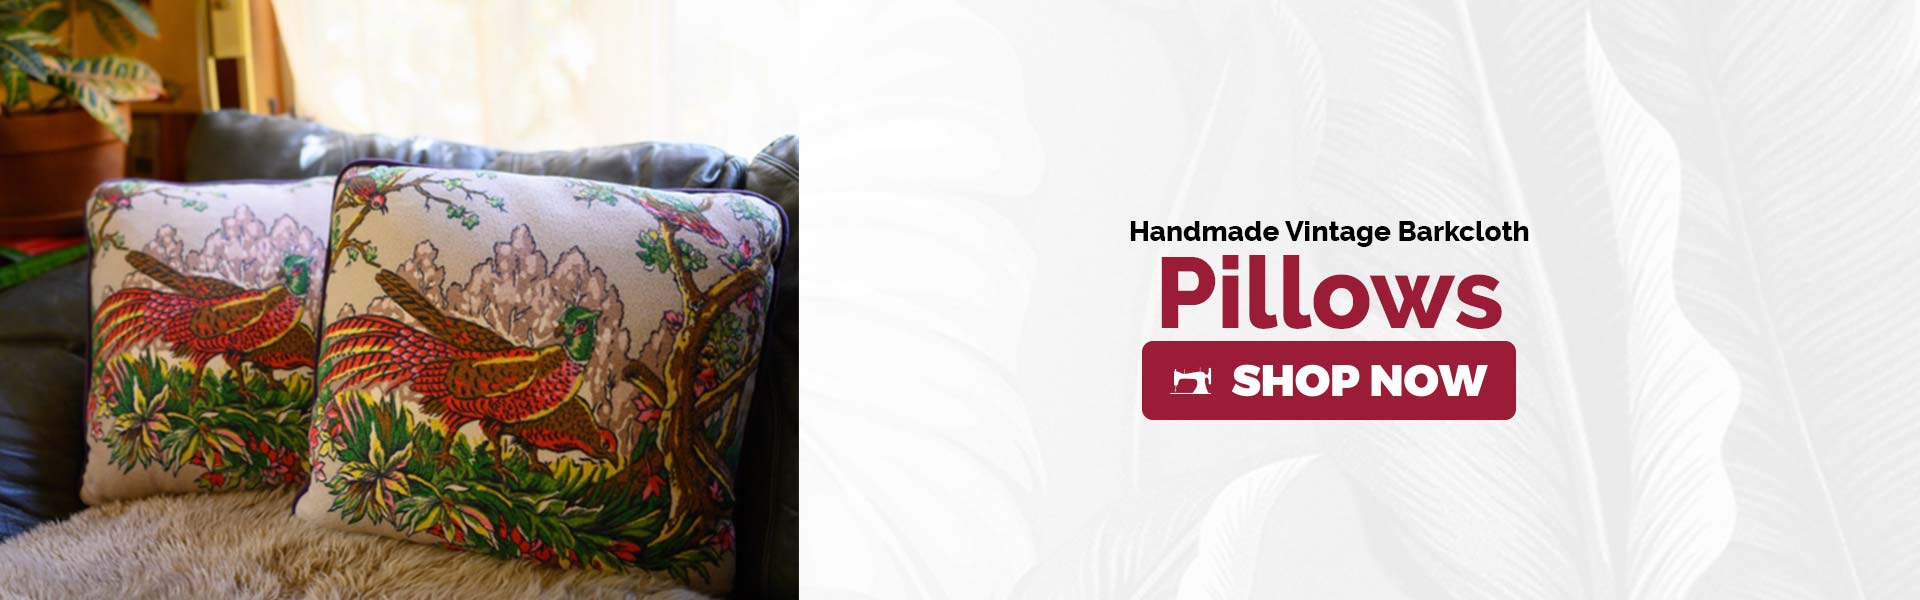 pillows-vintage-barkcloth